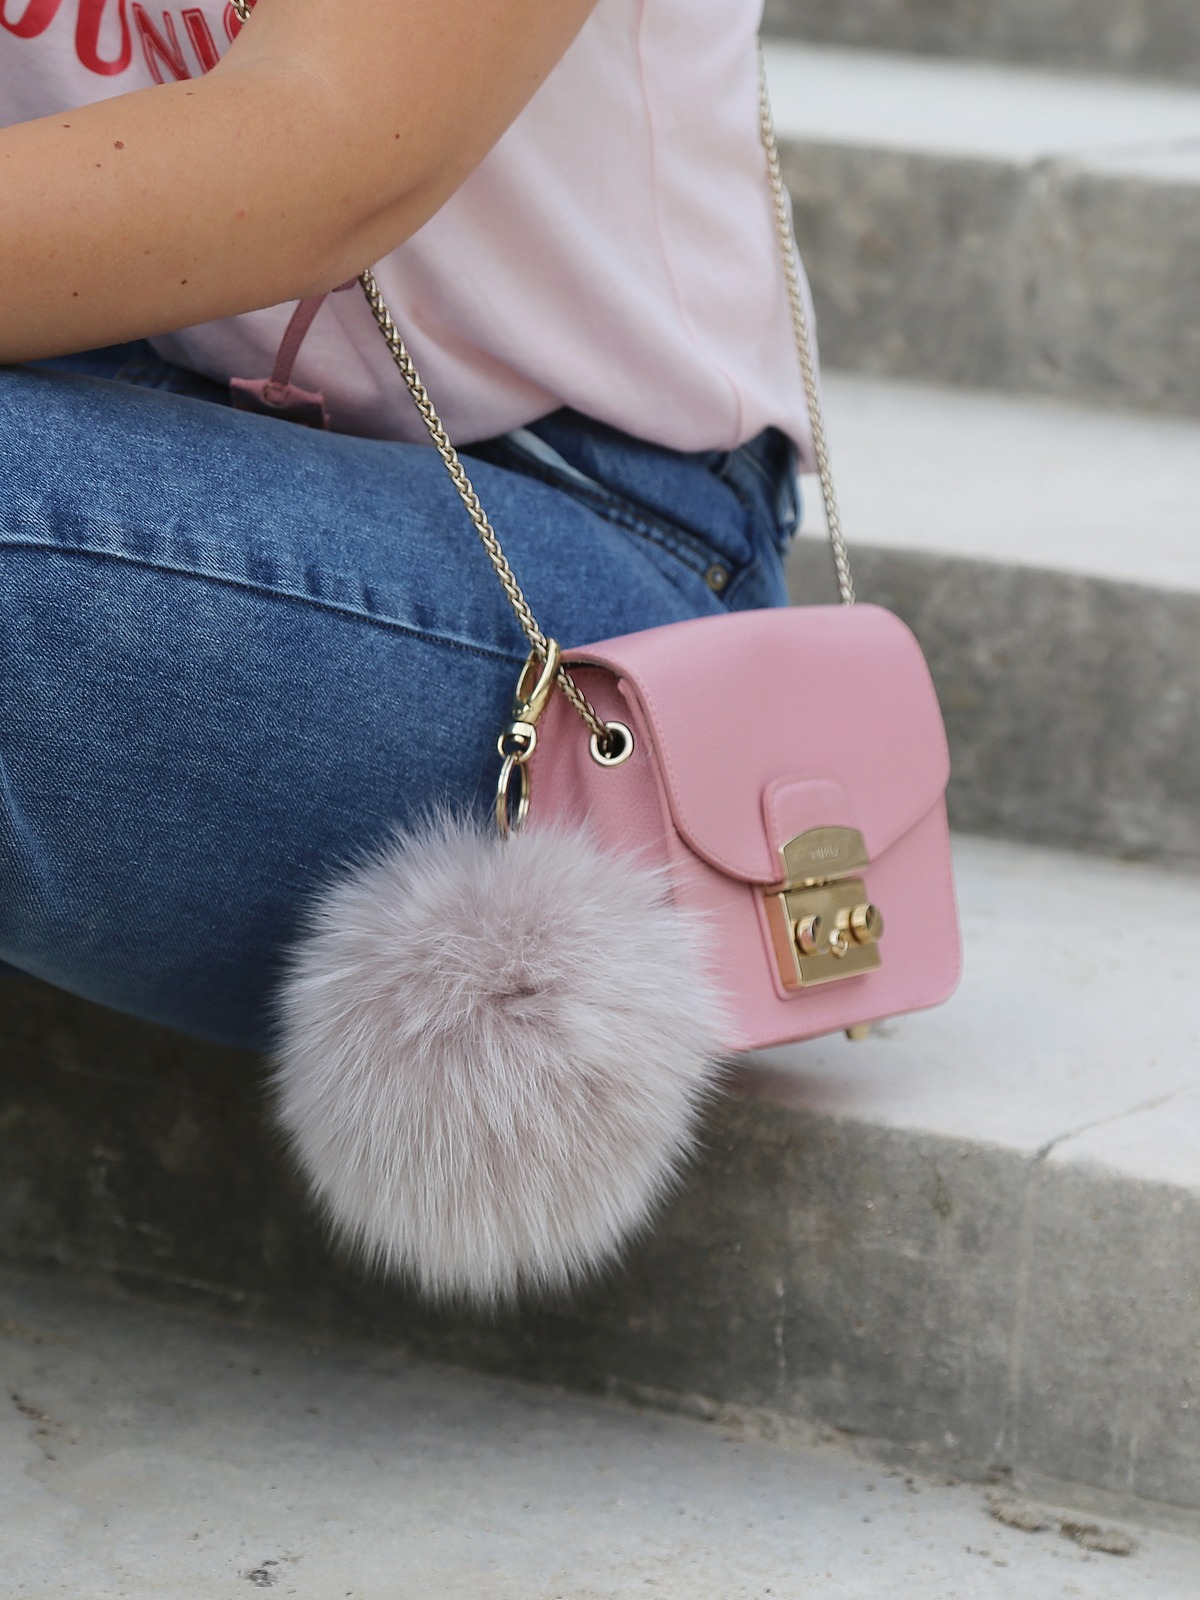 Blog mode femme Paris - Du style, Madame - streetstyle - furla metropolis